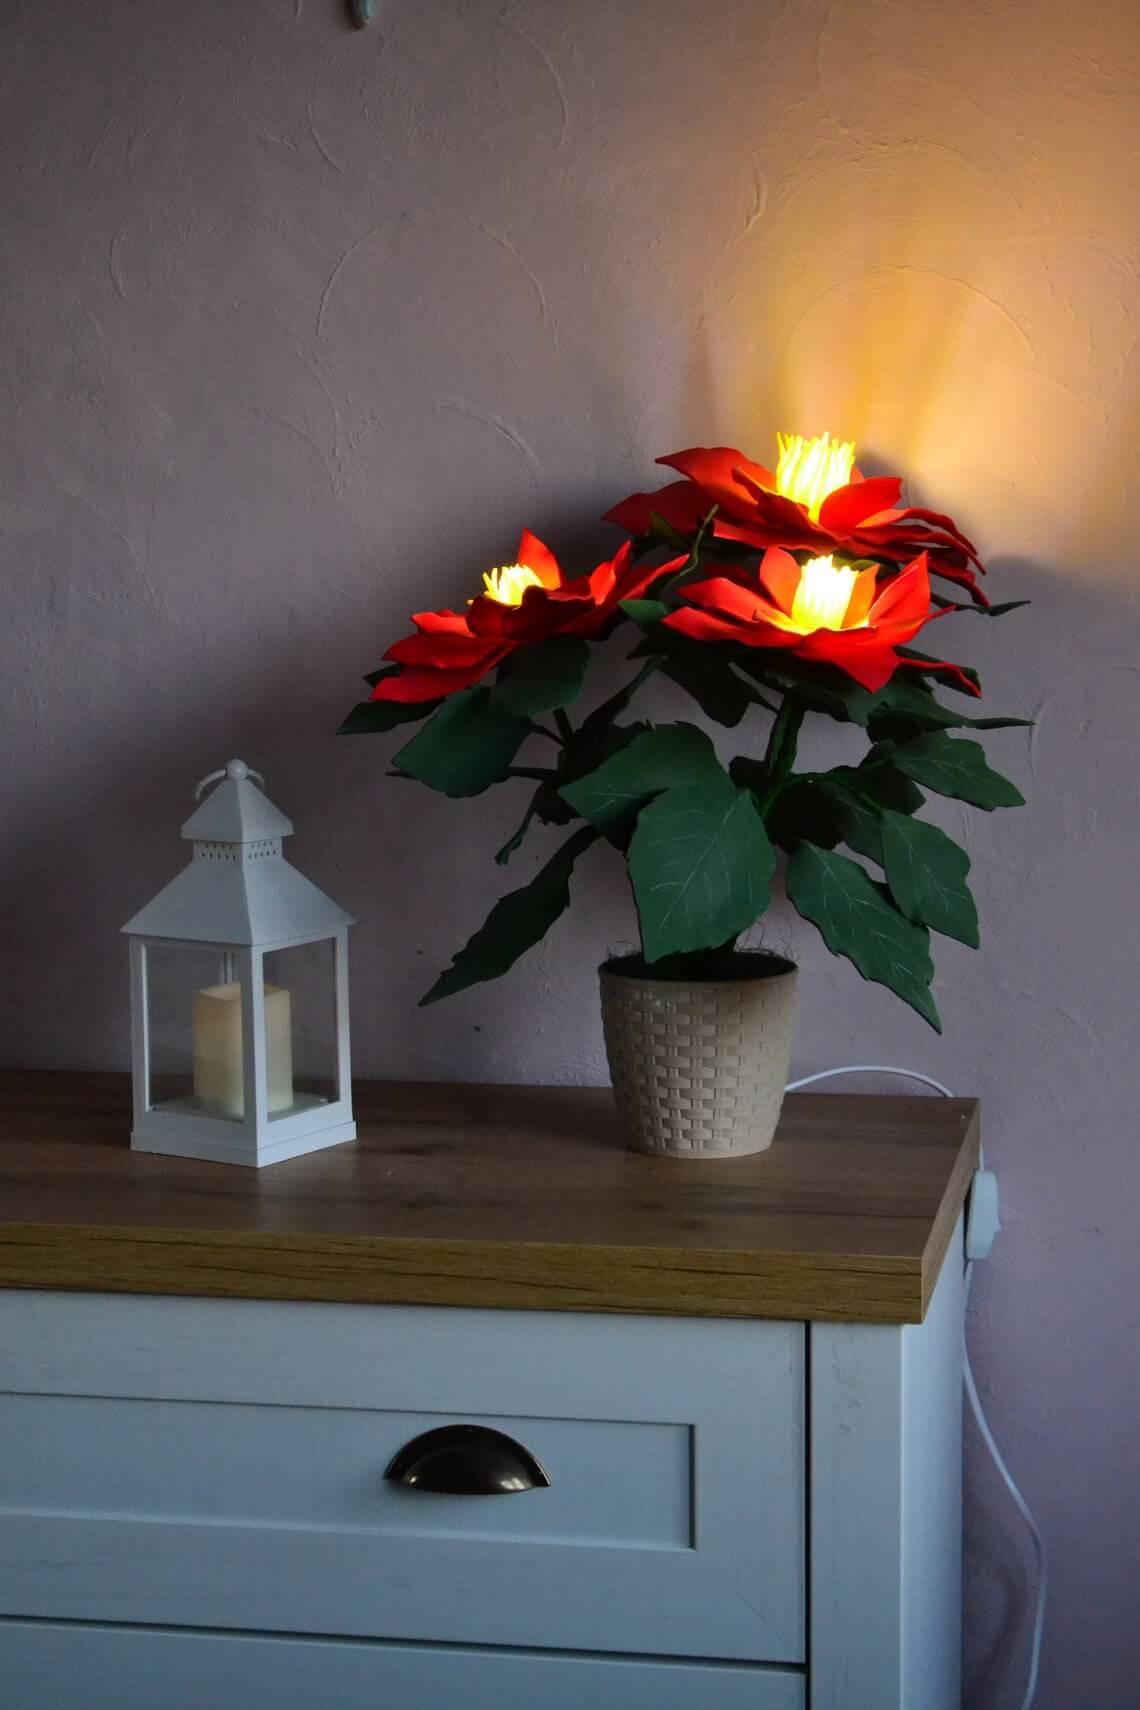 Poinsettia Decorative Floral Christmas Lights Lamp